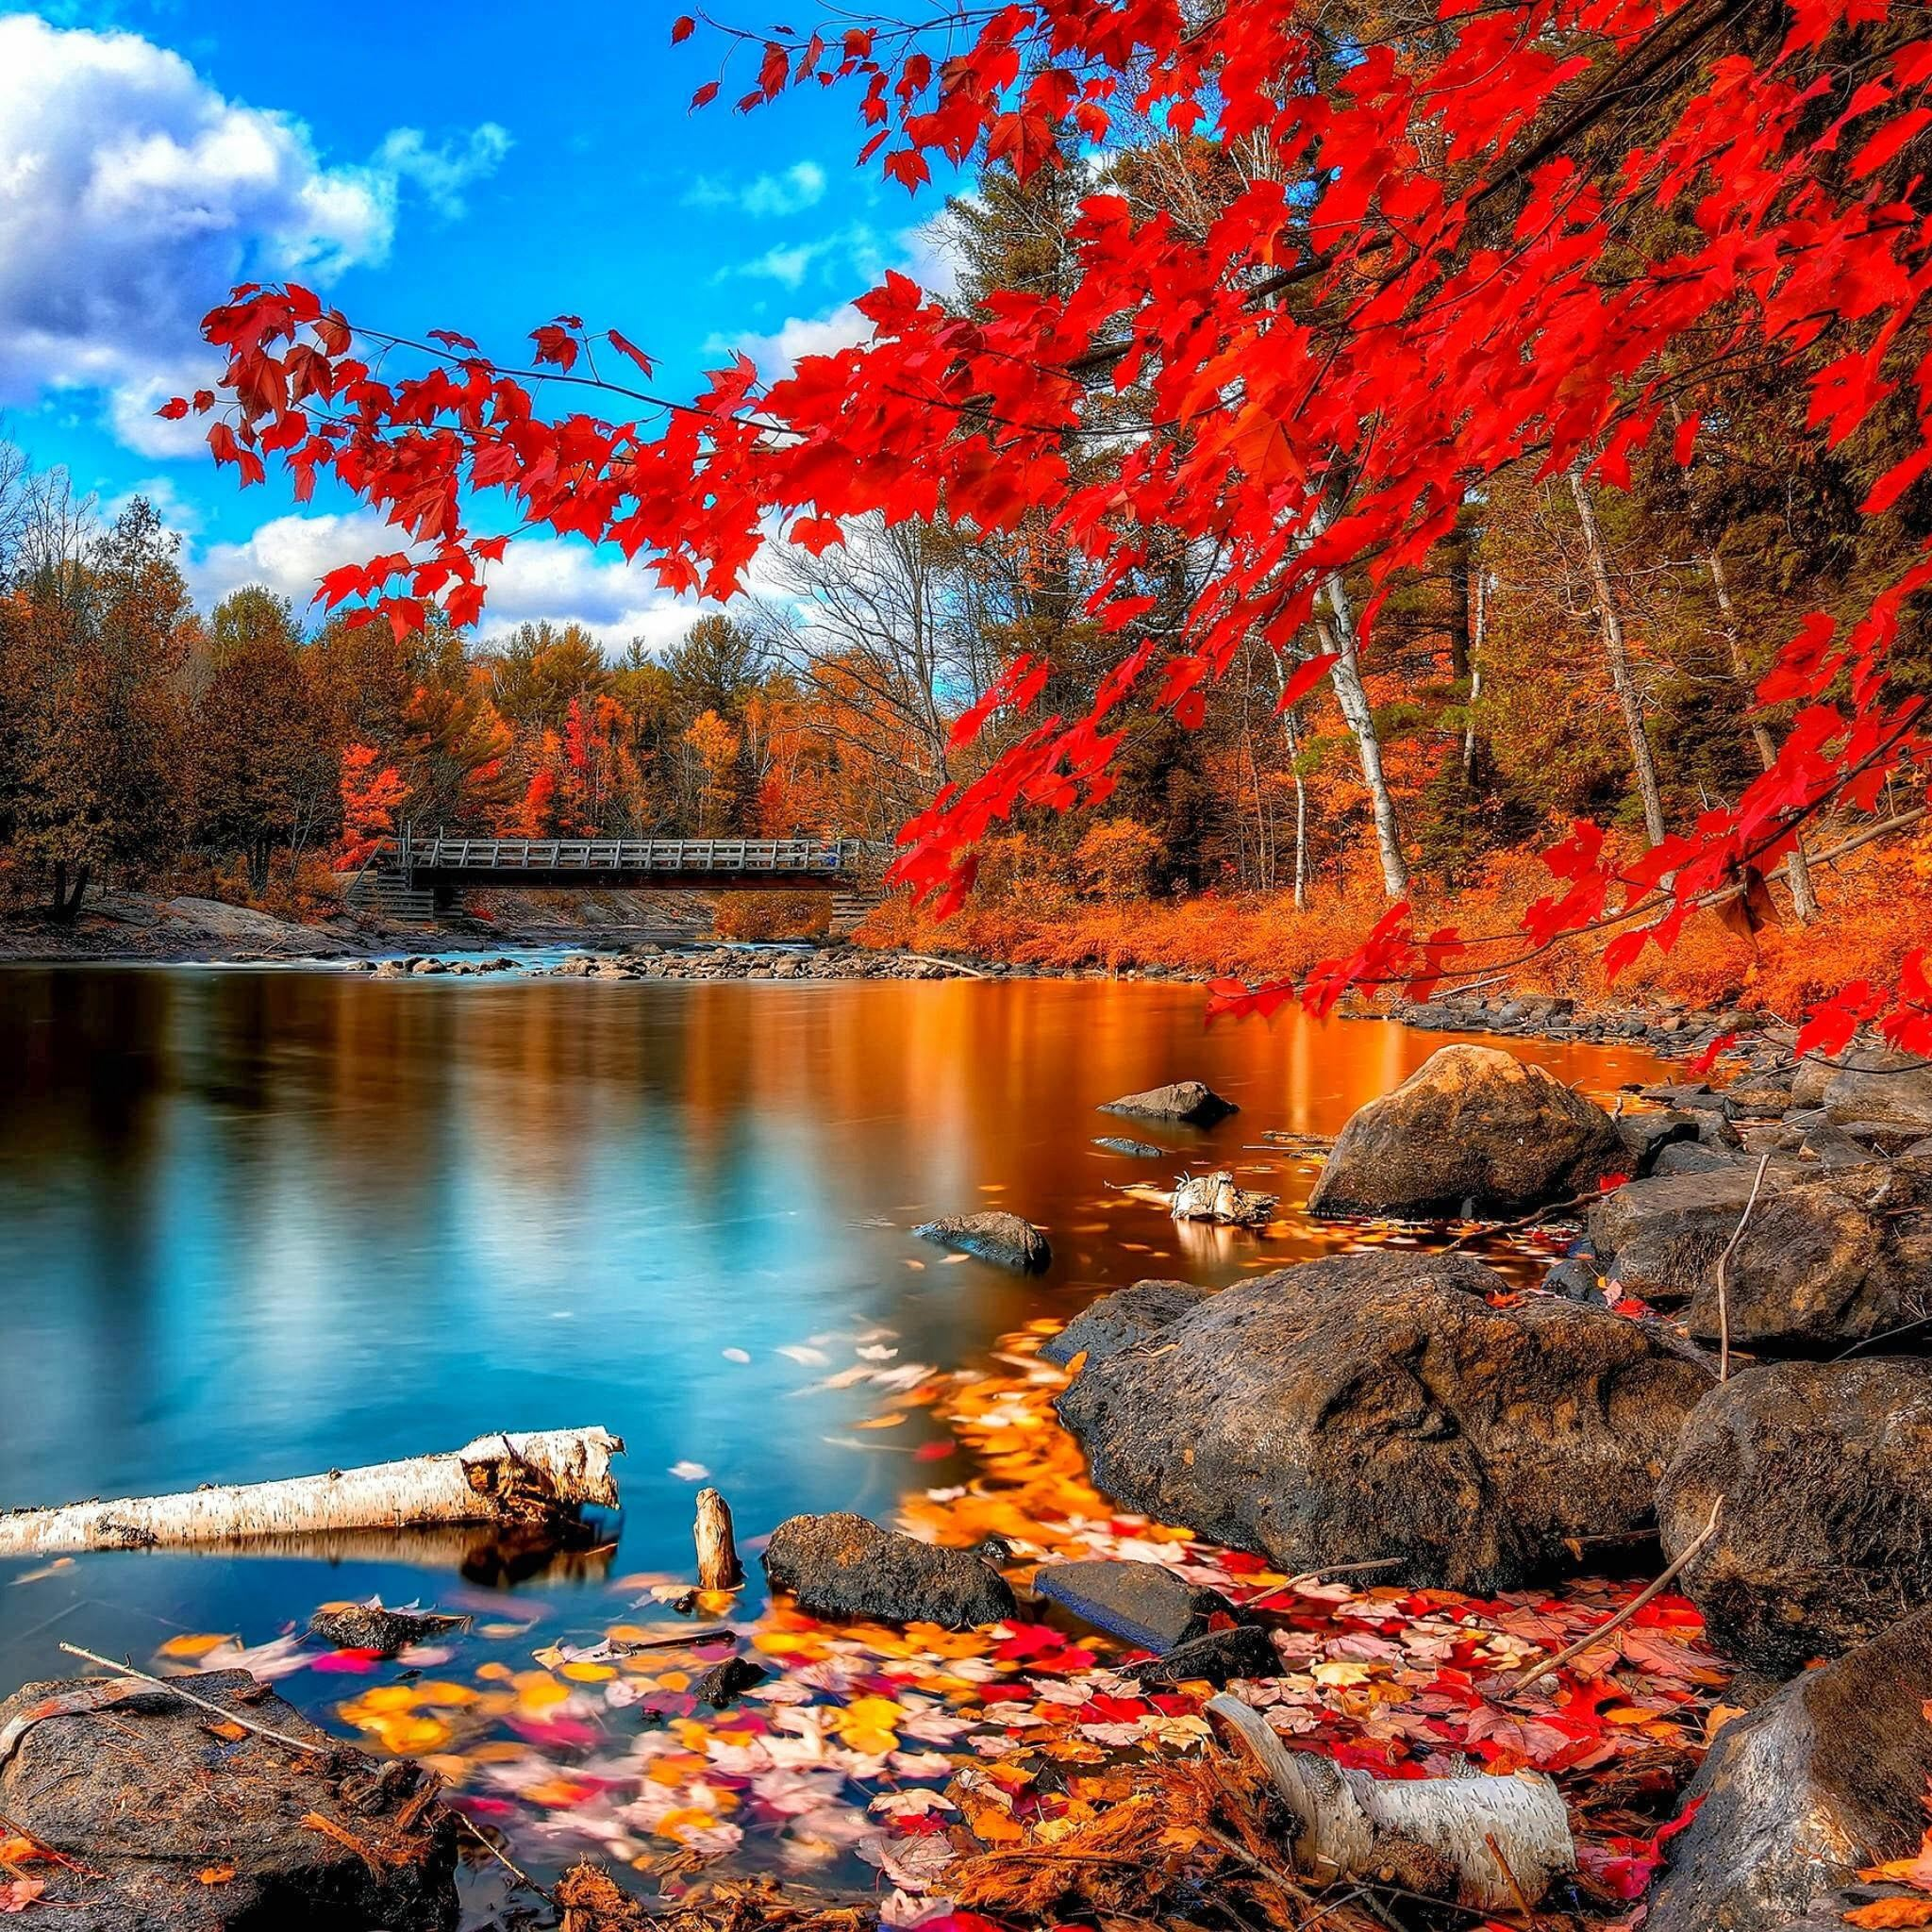 Nature Autumn Red Leaf Calm Lake Landscape IPad Air Wallpaper